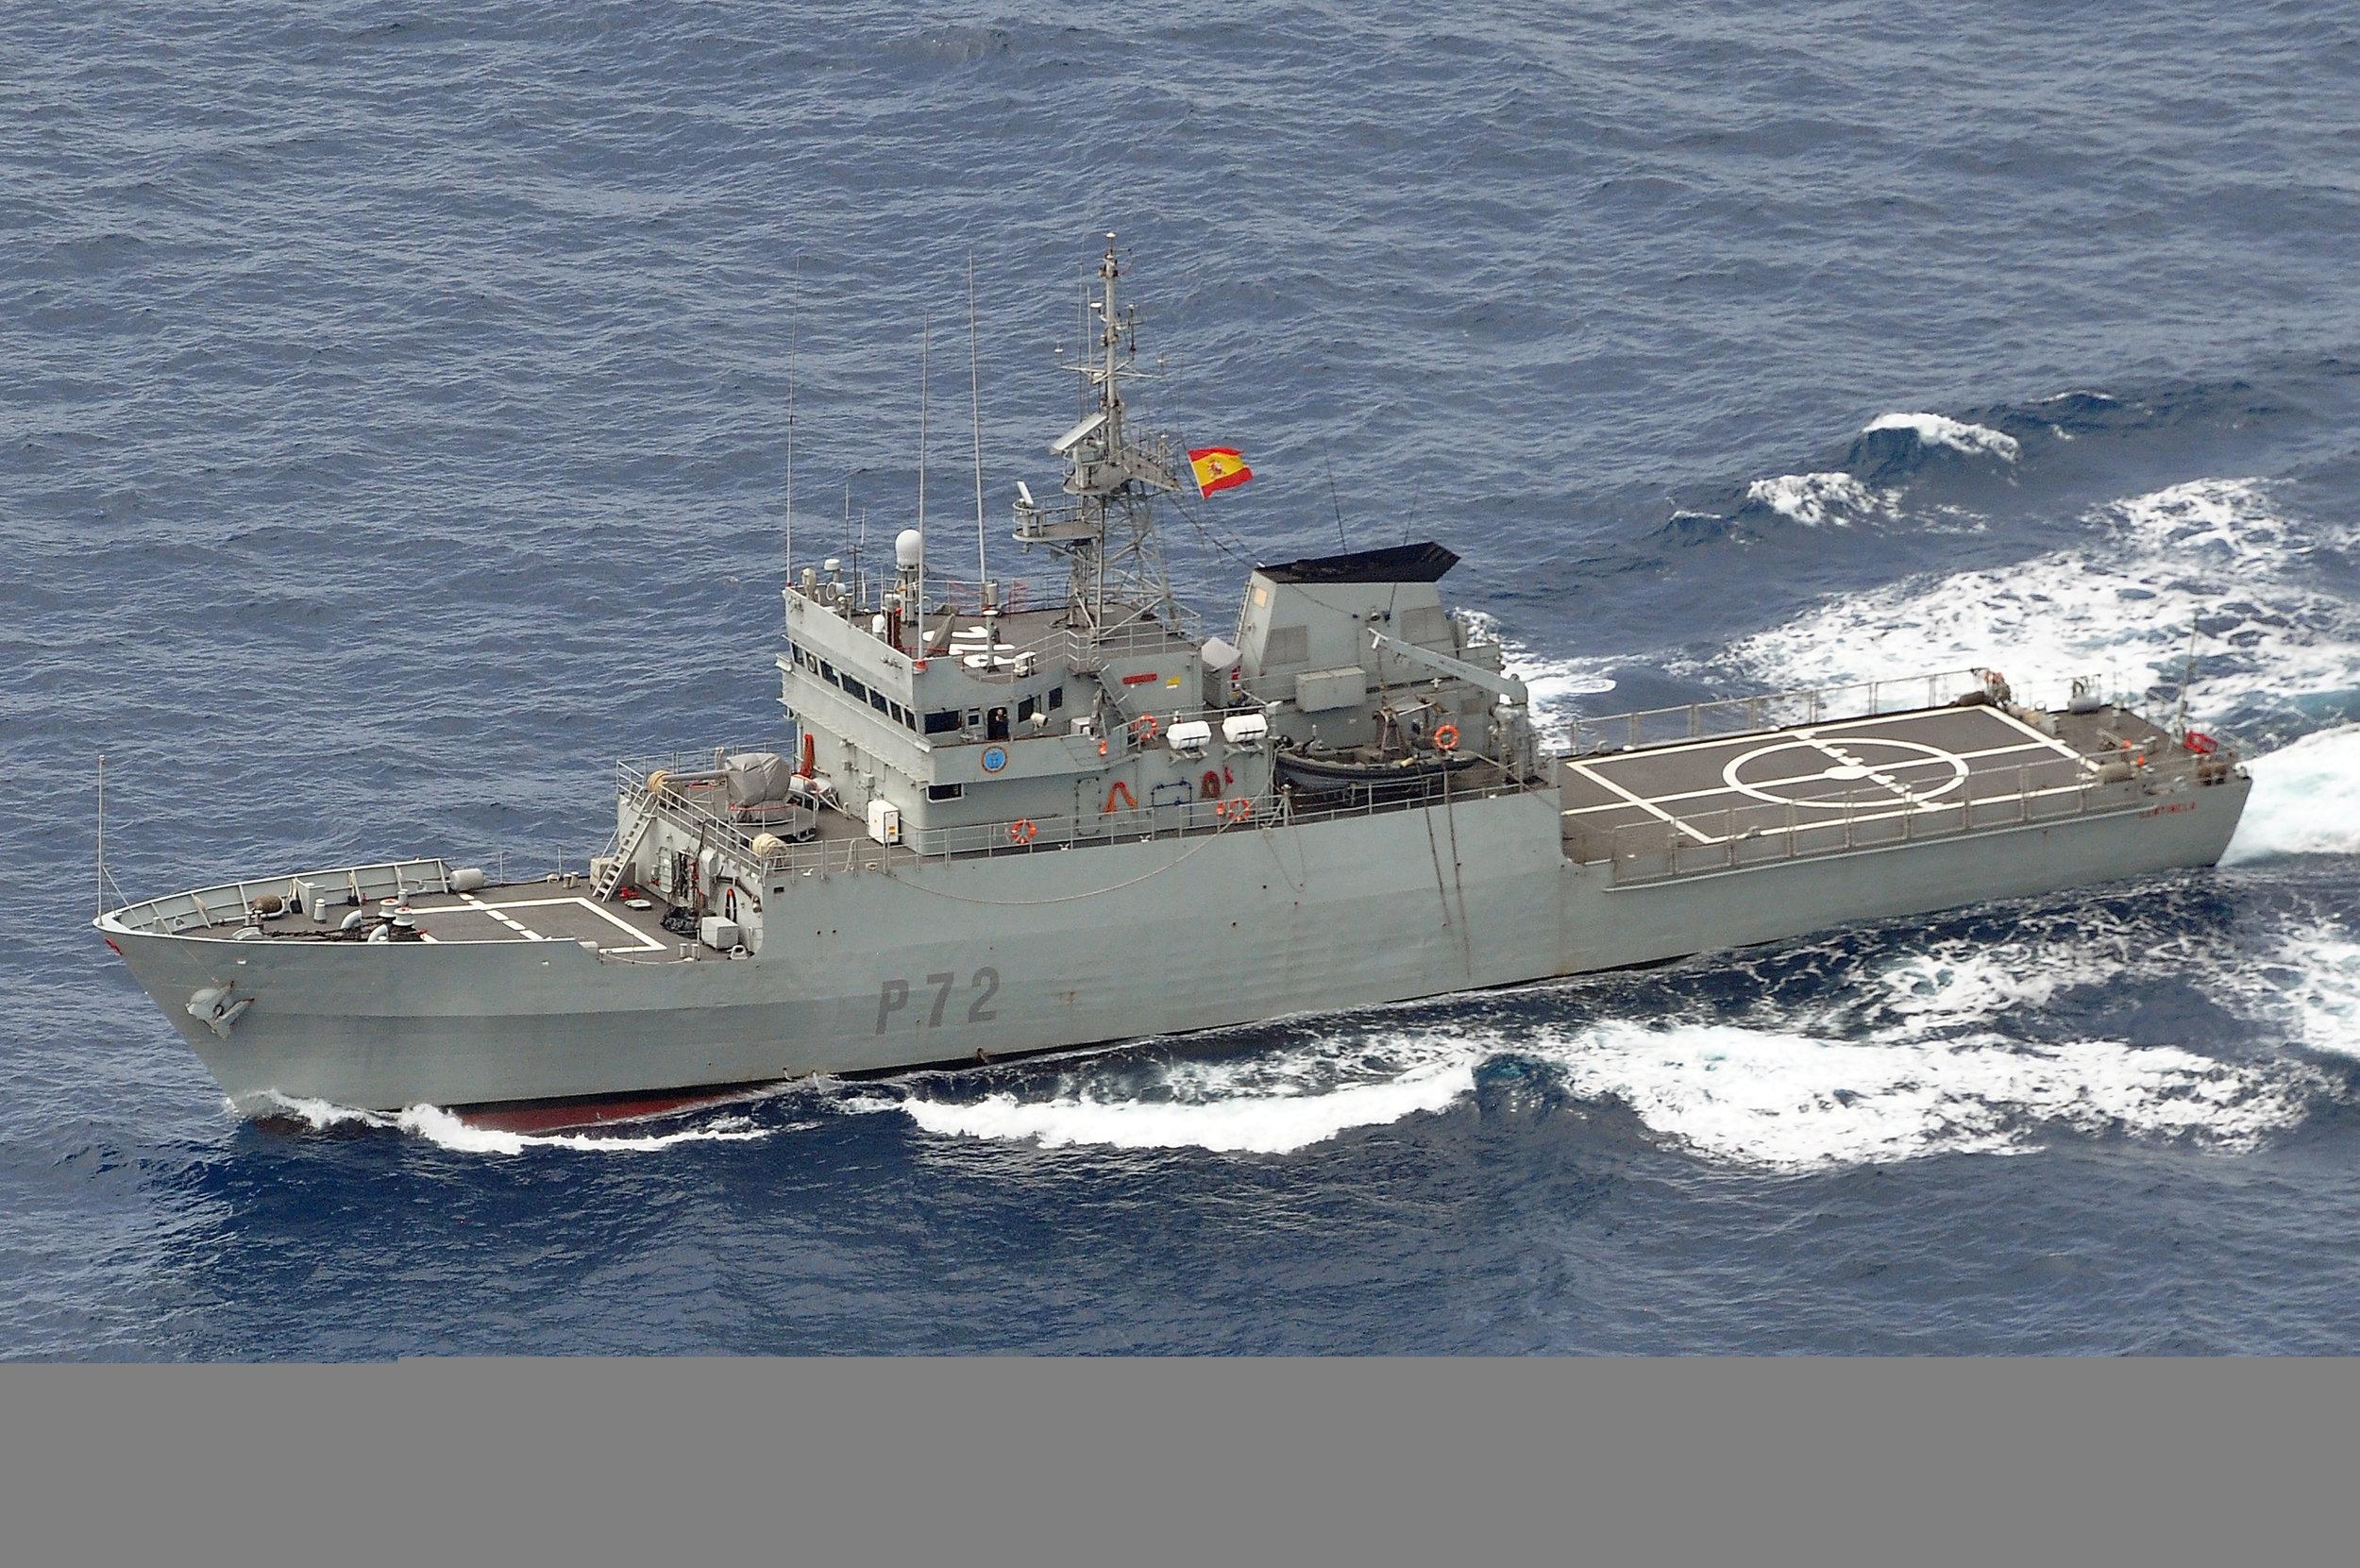 ESPS Centinela - photo courtesy Spanish Navy